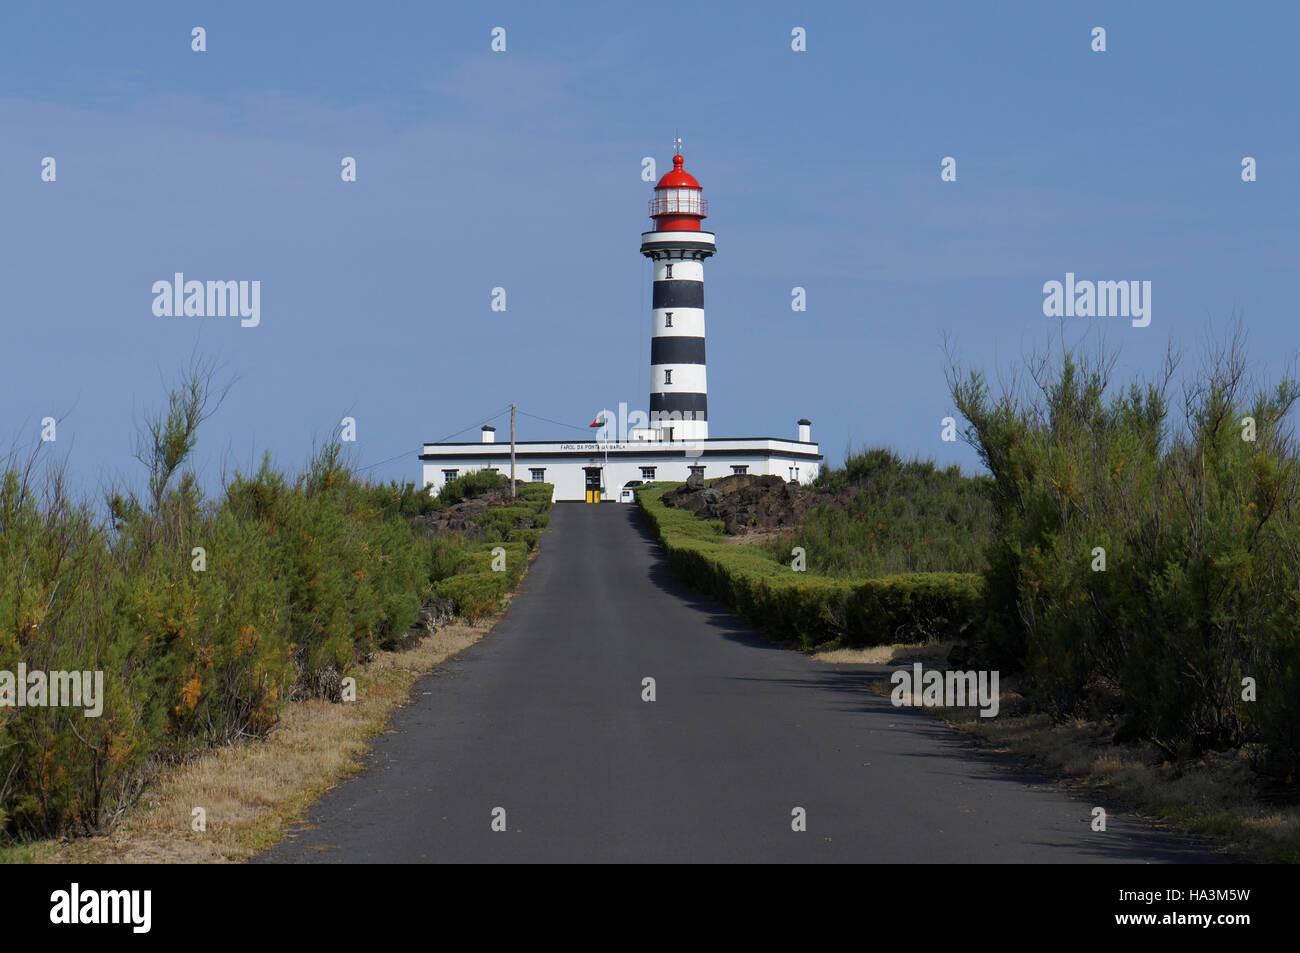 Ponta da Barca lighthouse. Graciosa Island, Azores. Portugal - Stock Image